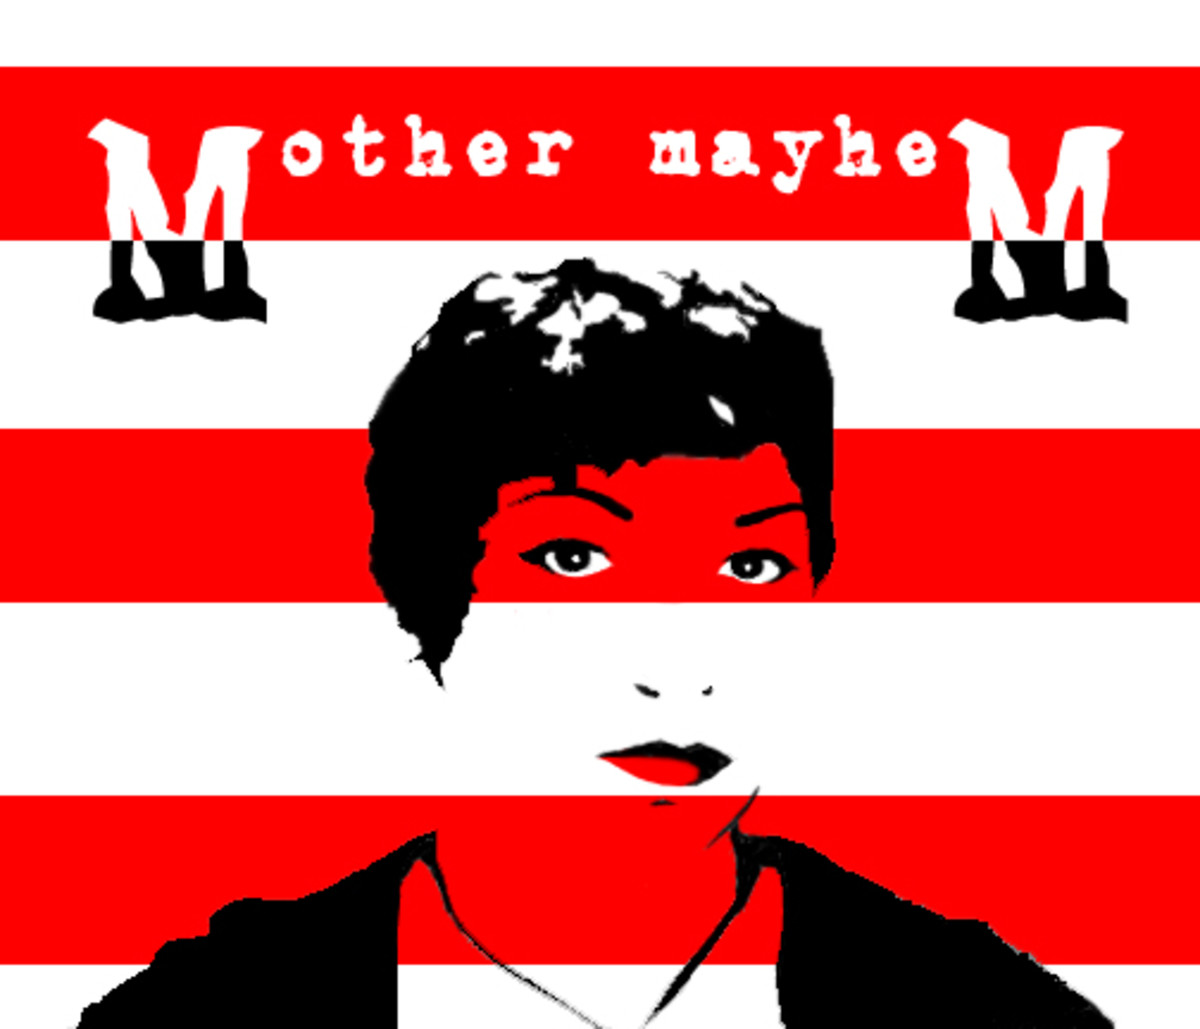 'Mother Mayhem' By EnfantDeriviere on DeviantArt.net